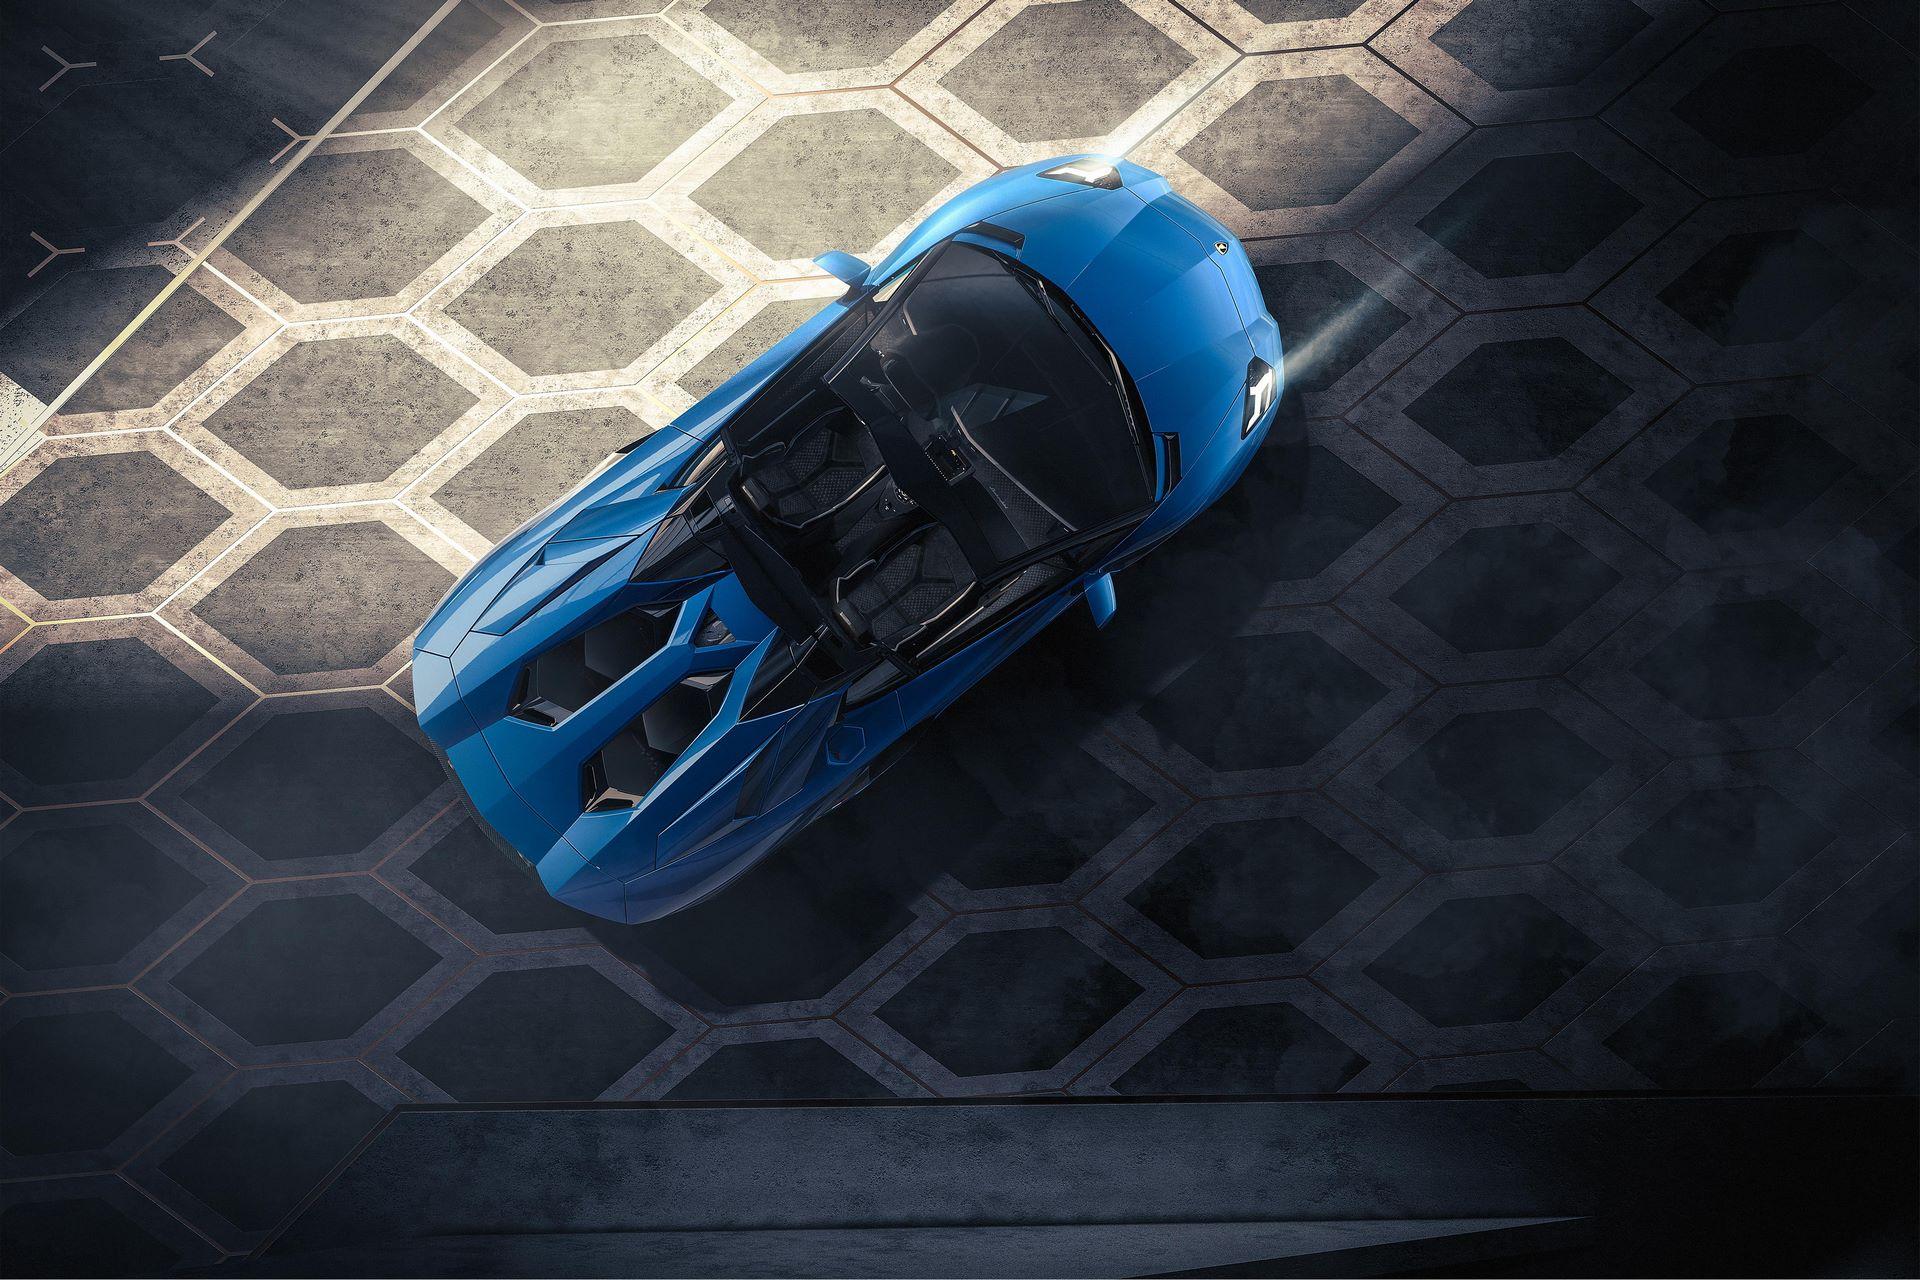 Lamborghini-Aventador-LP780-4-Ultimae-24